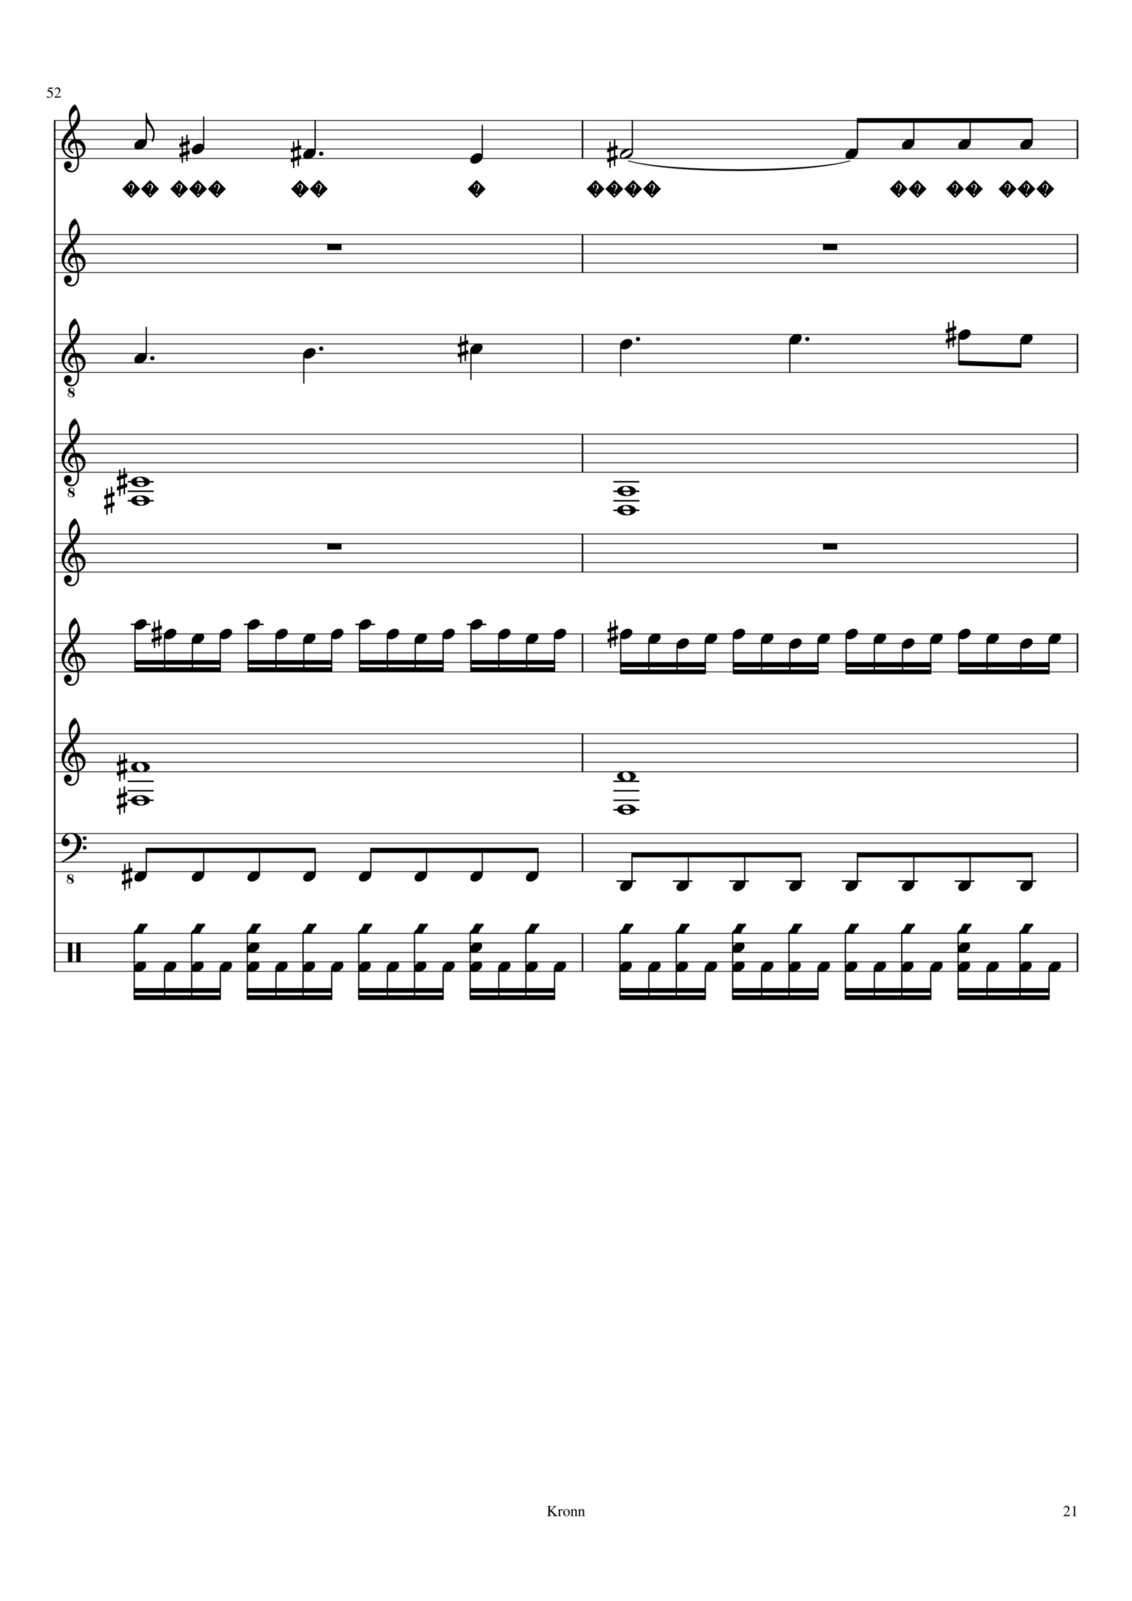 Ispoved Pervogo Boga slide, Image 21